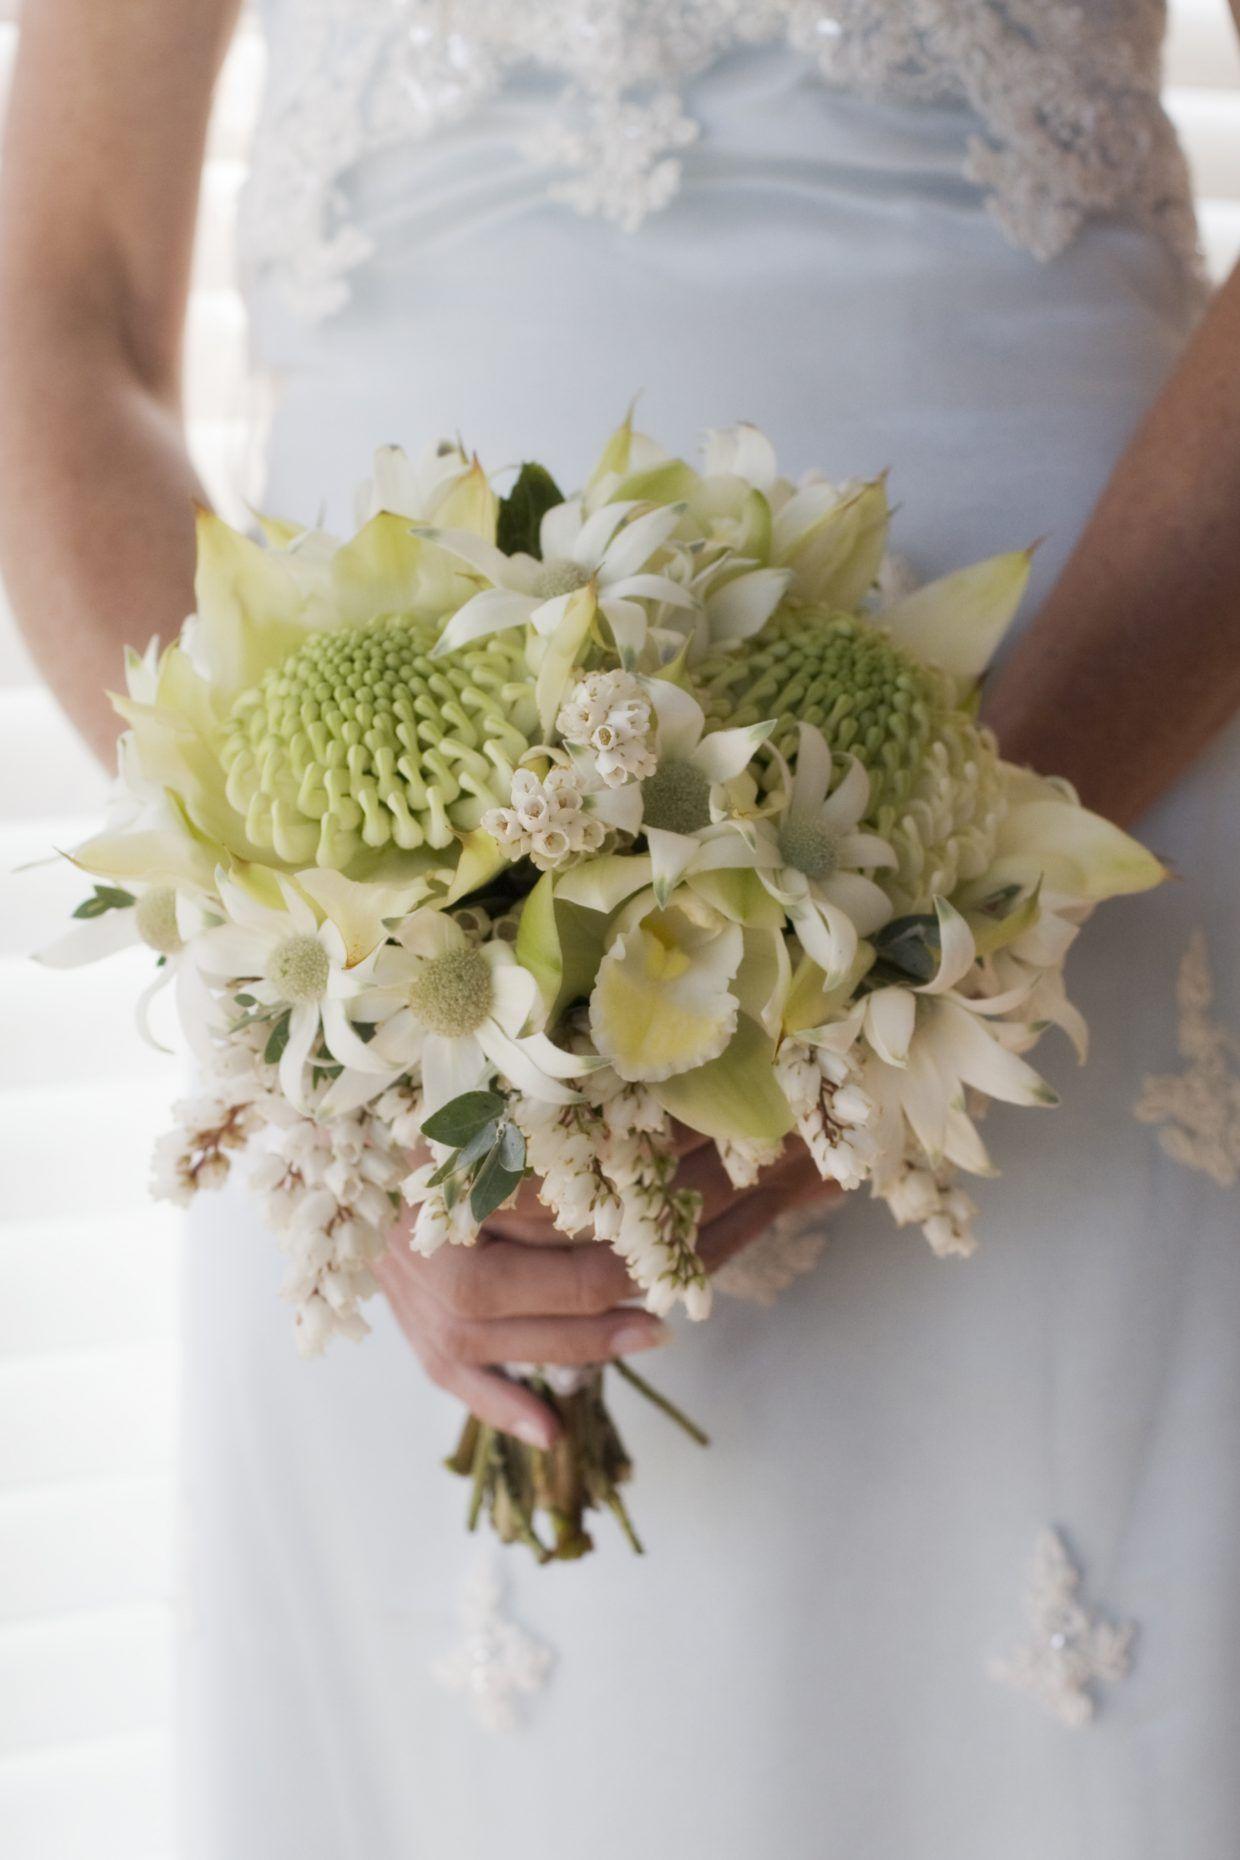 15 native wedding flowers a brides guide wedding bouquet styles wedding posy izmirmasajfo